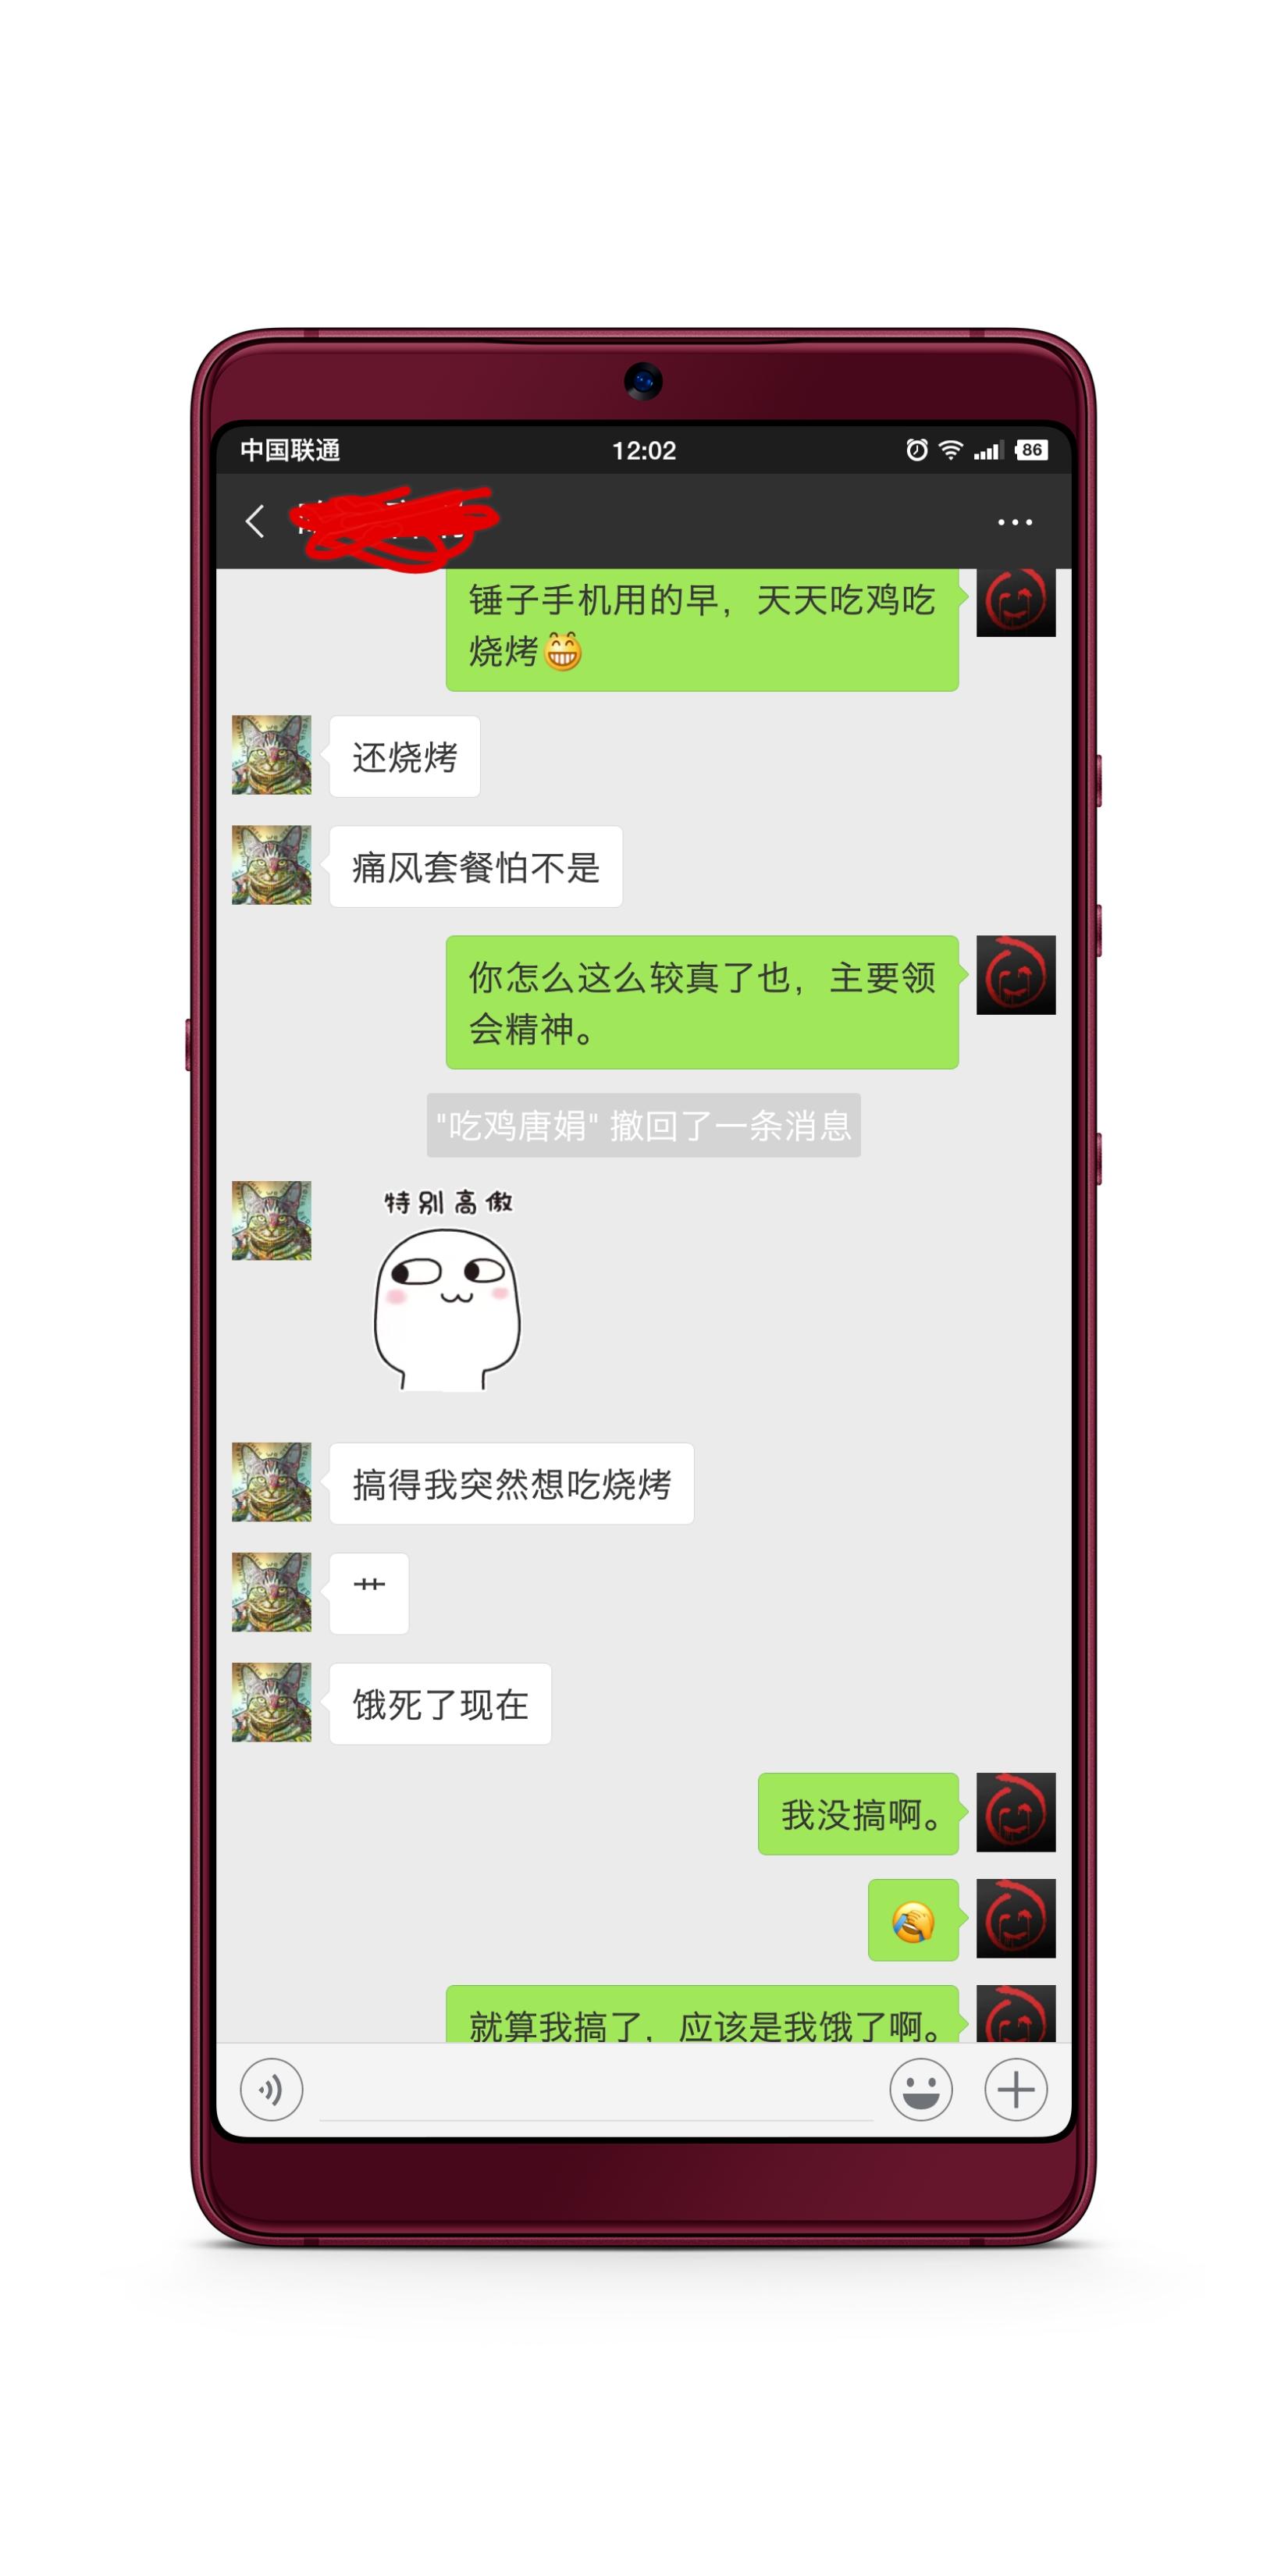 ??_Screenshot_2018-10-31-12-02-26-207_??.png